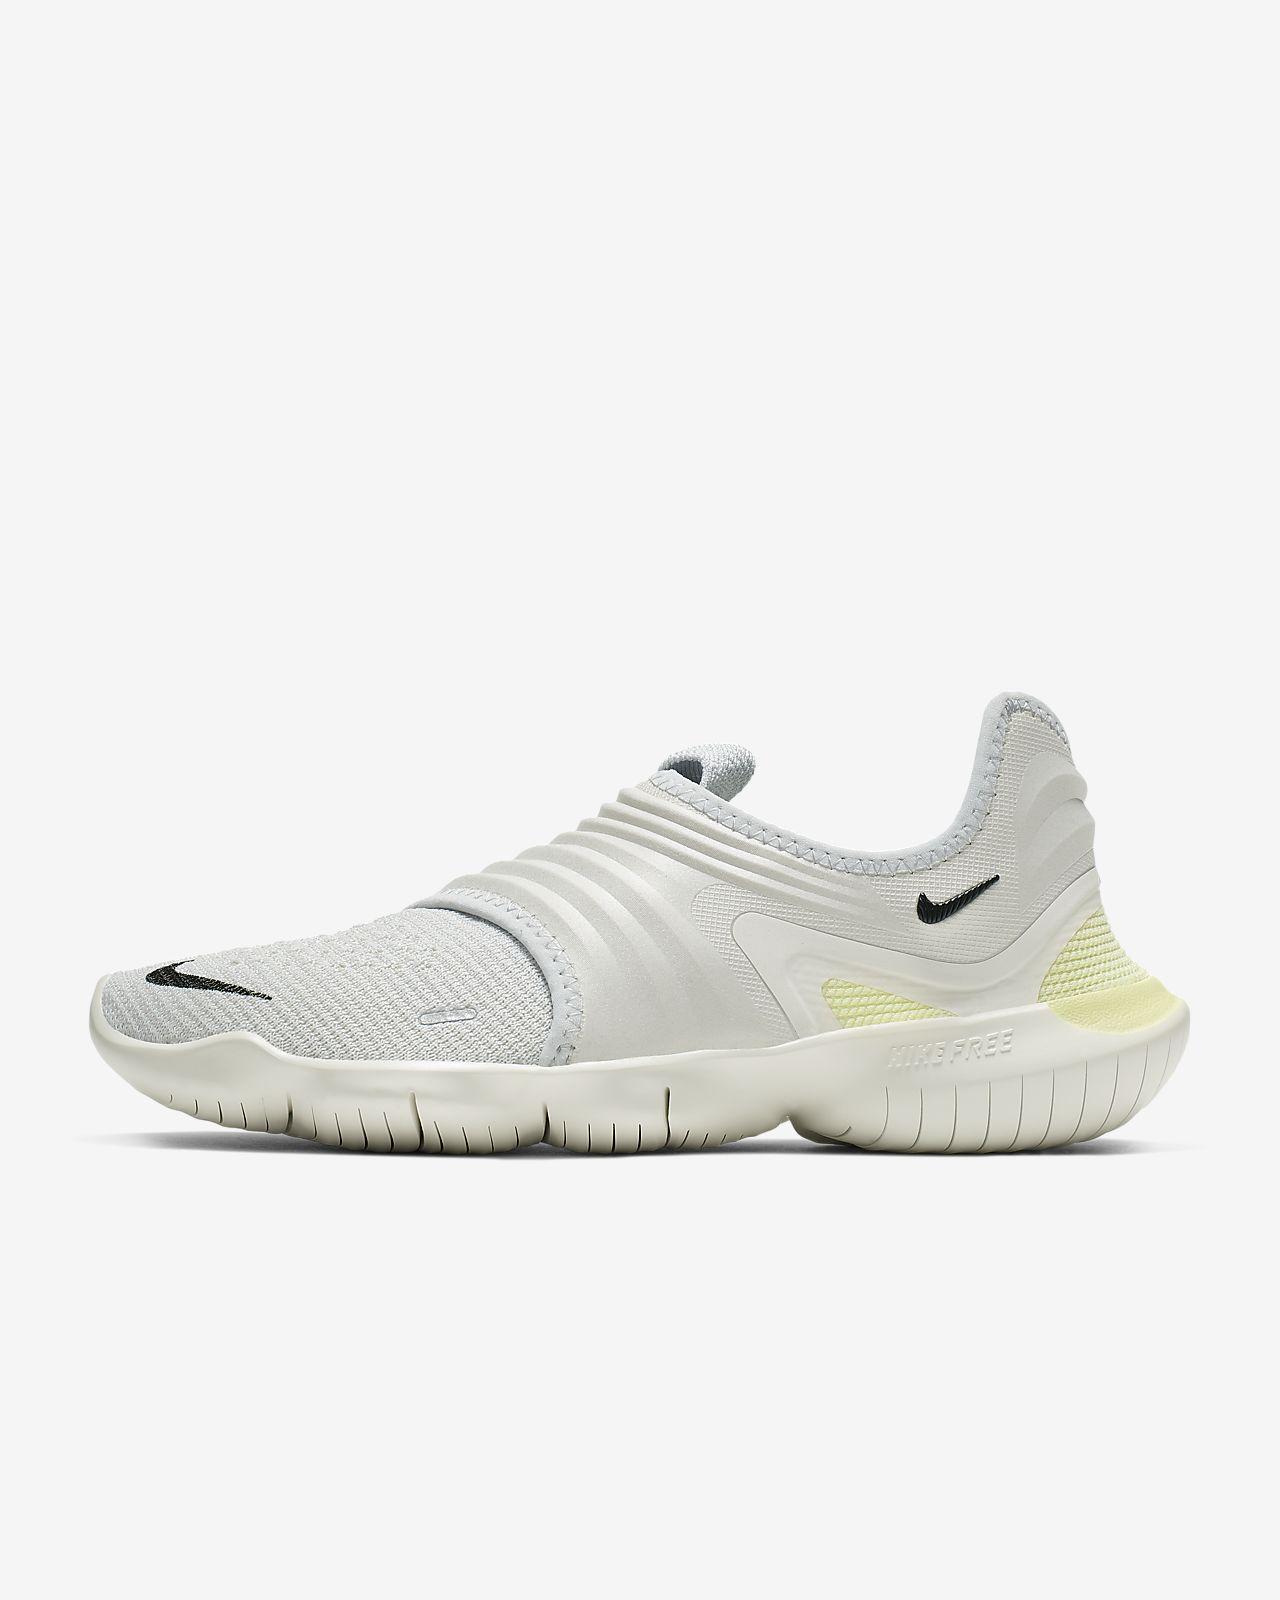 the best attitude 67f10 b4ca1 ... Chaussure de running Nike Free RN Flyknit 3.0 pour Femme